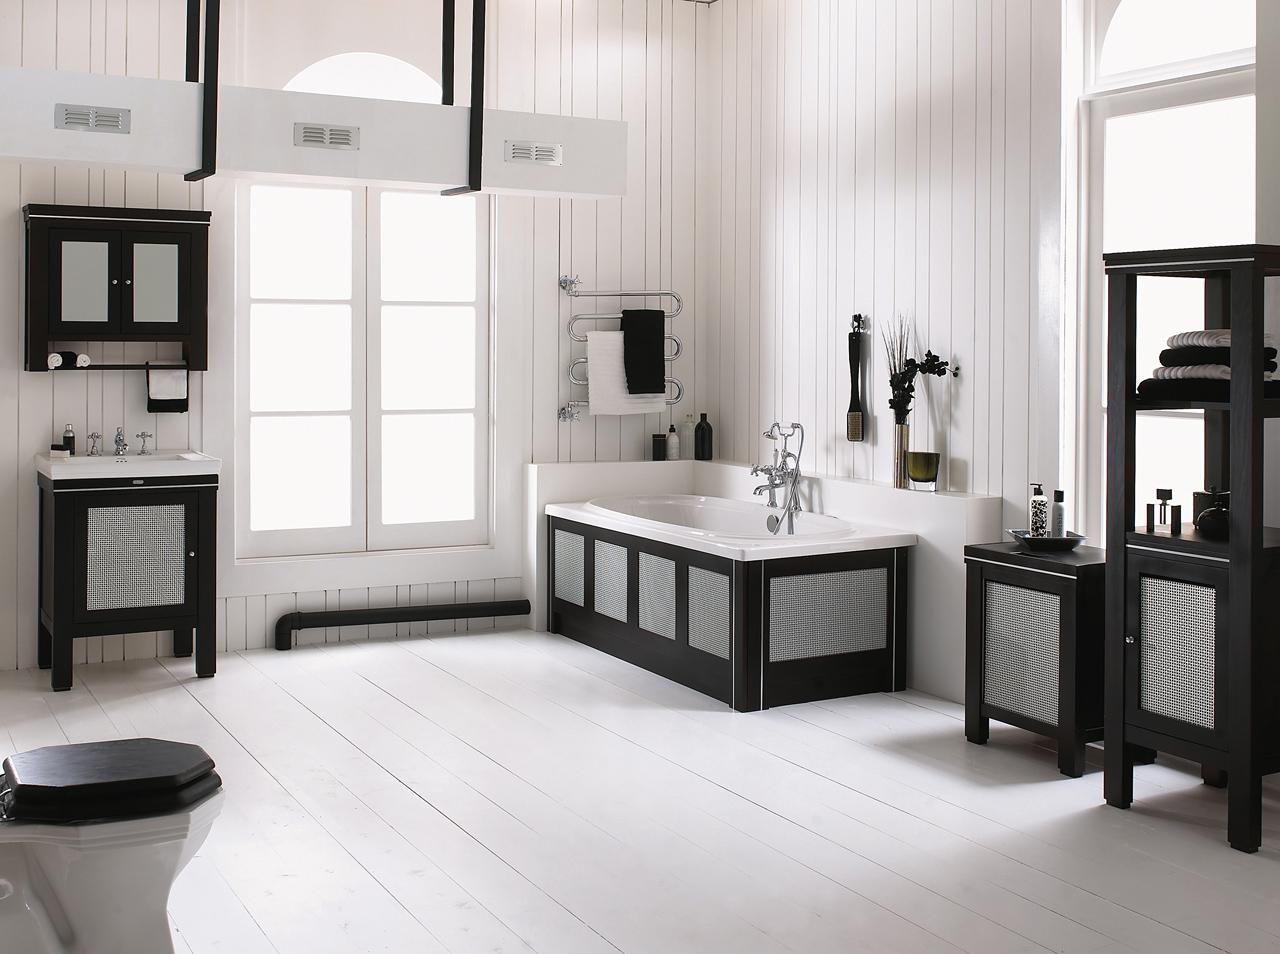 Classic Bathrooms: Imperial Bathrooms - Cuda-wenge-final-main_retouch